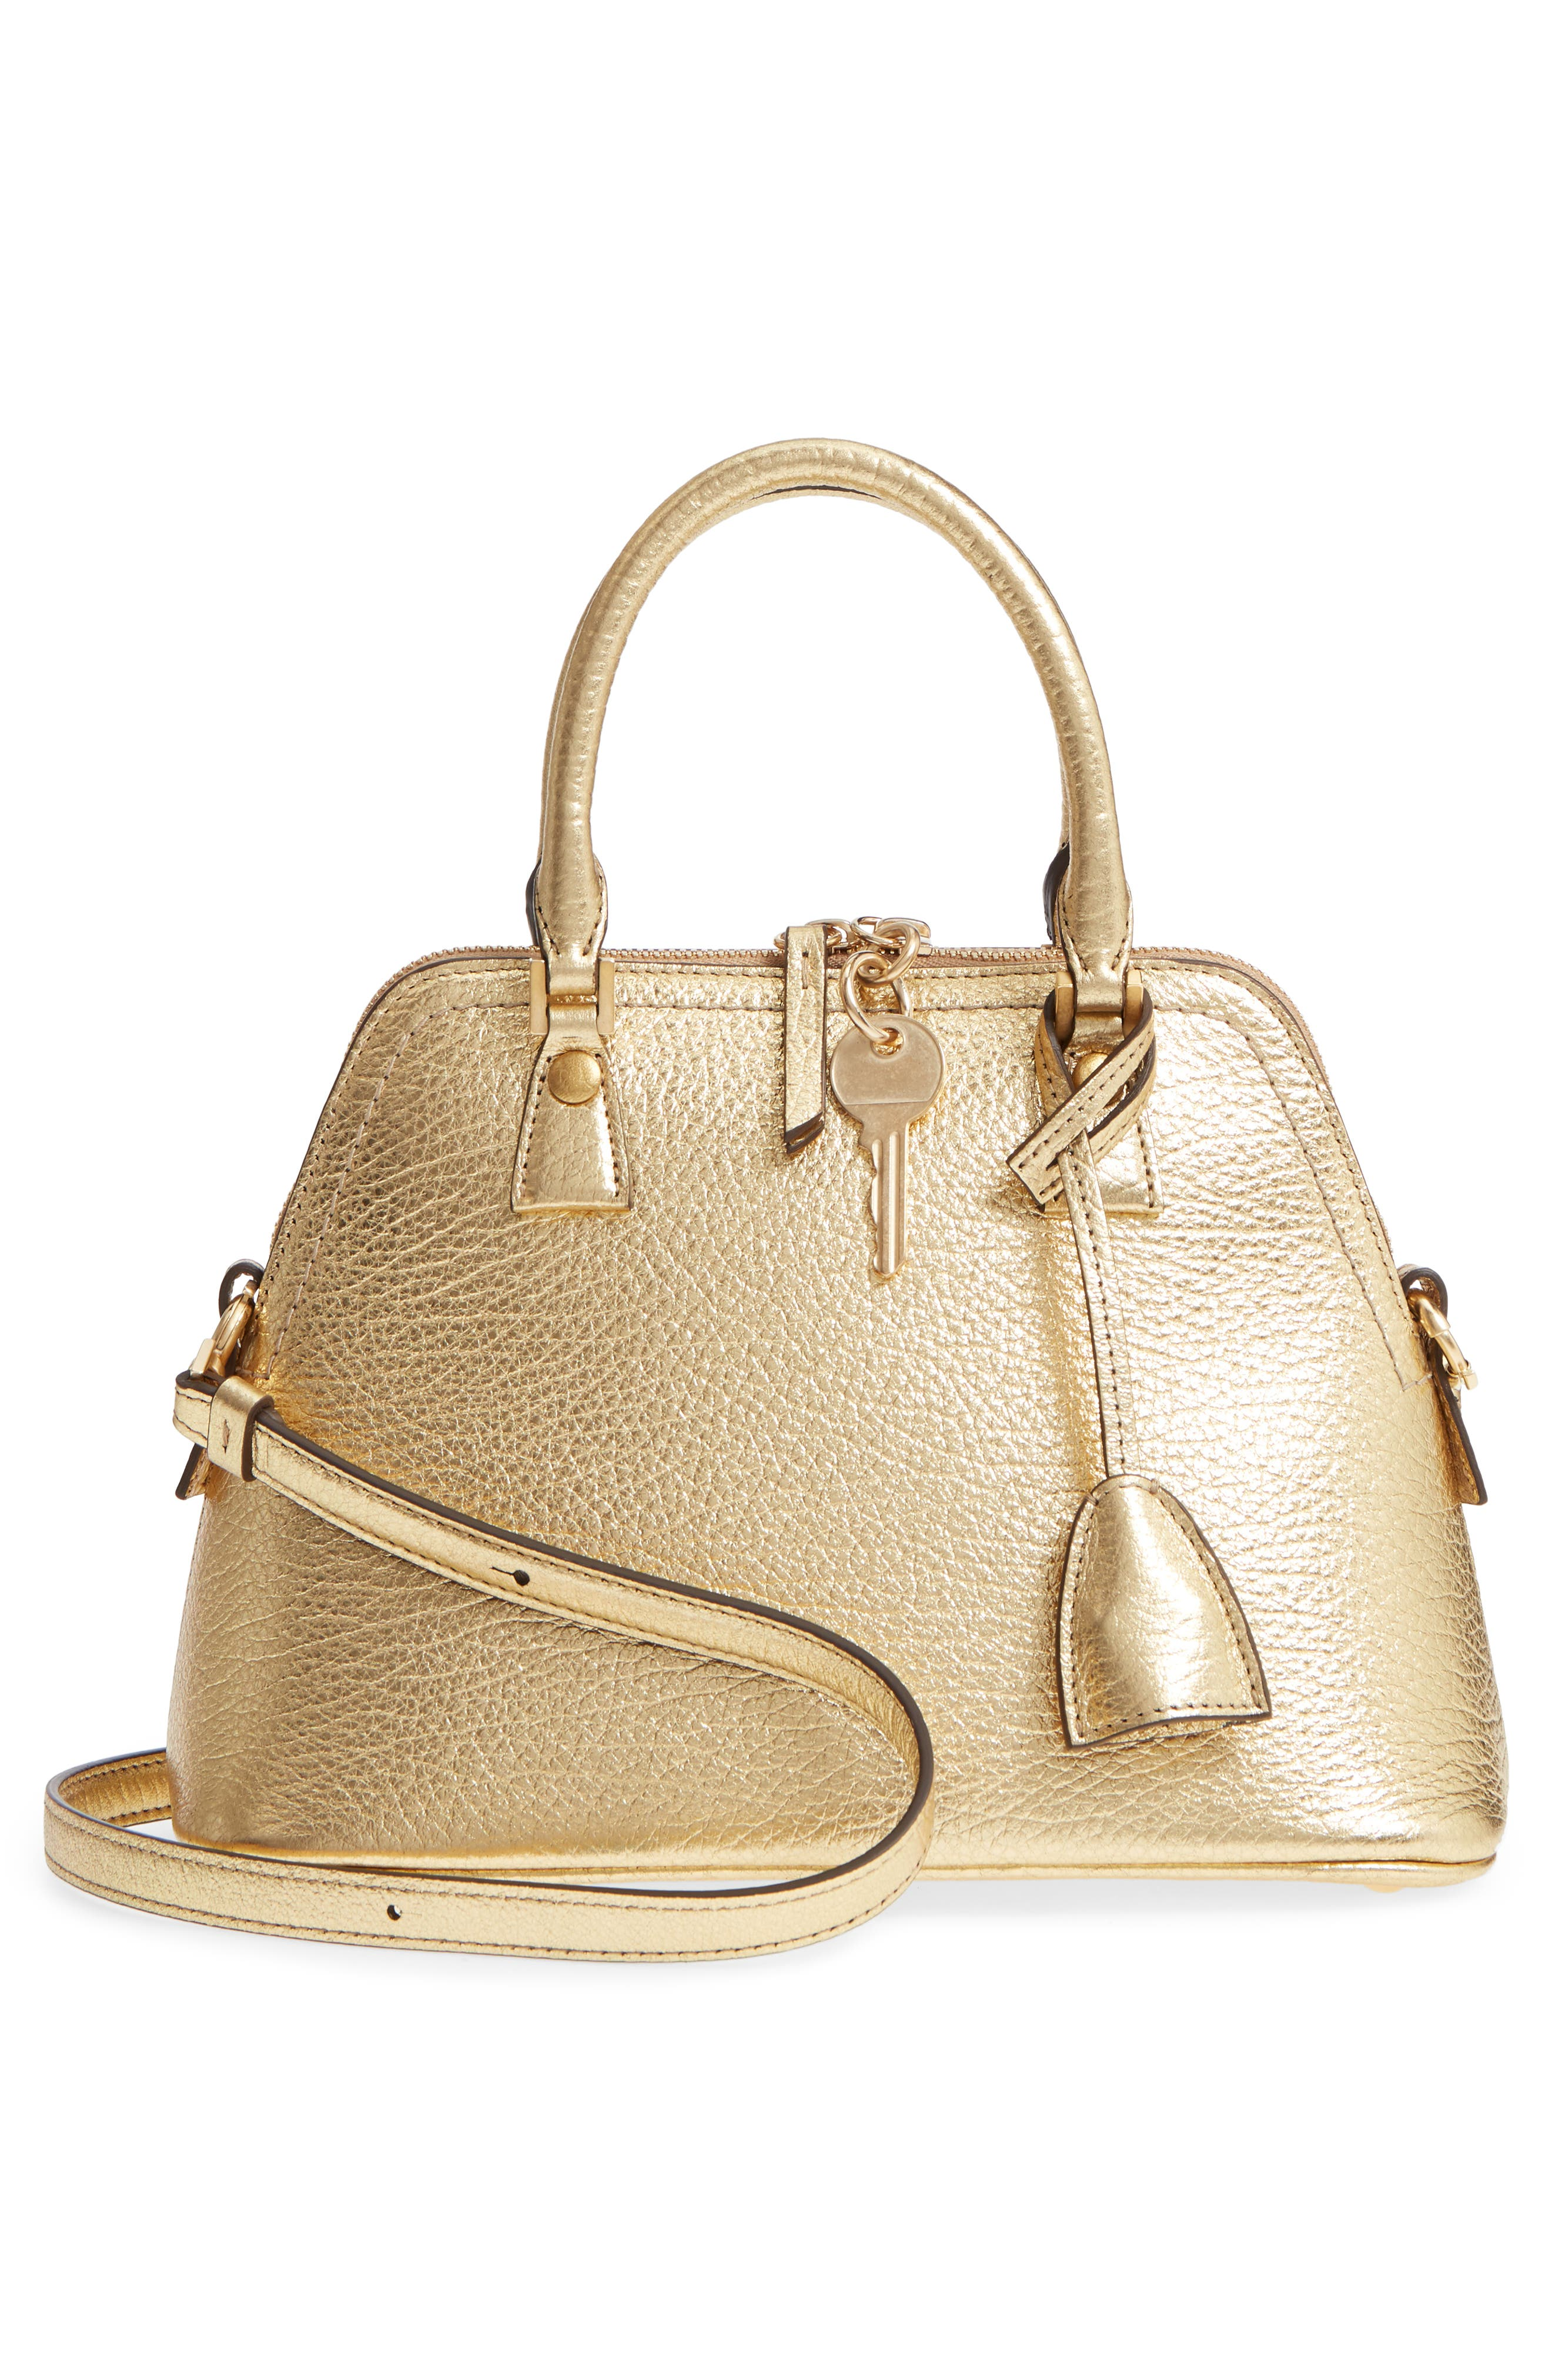 Small 5AC Calfskin Leather Handbag,                             Alternate thumbnail 3, color,                             Gold